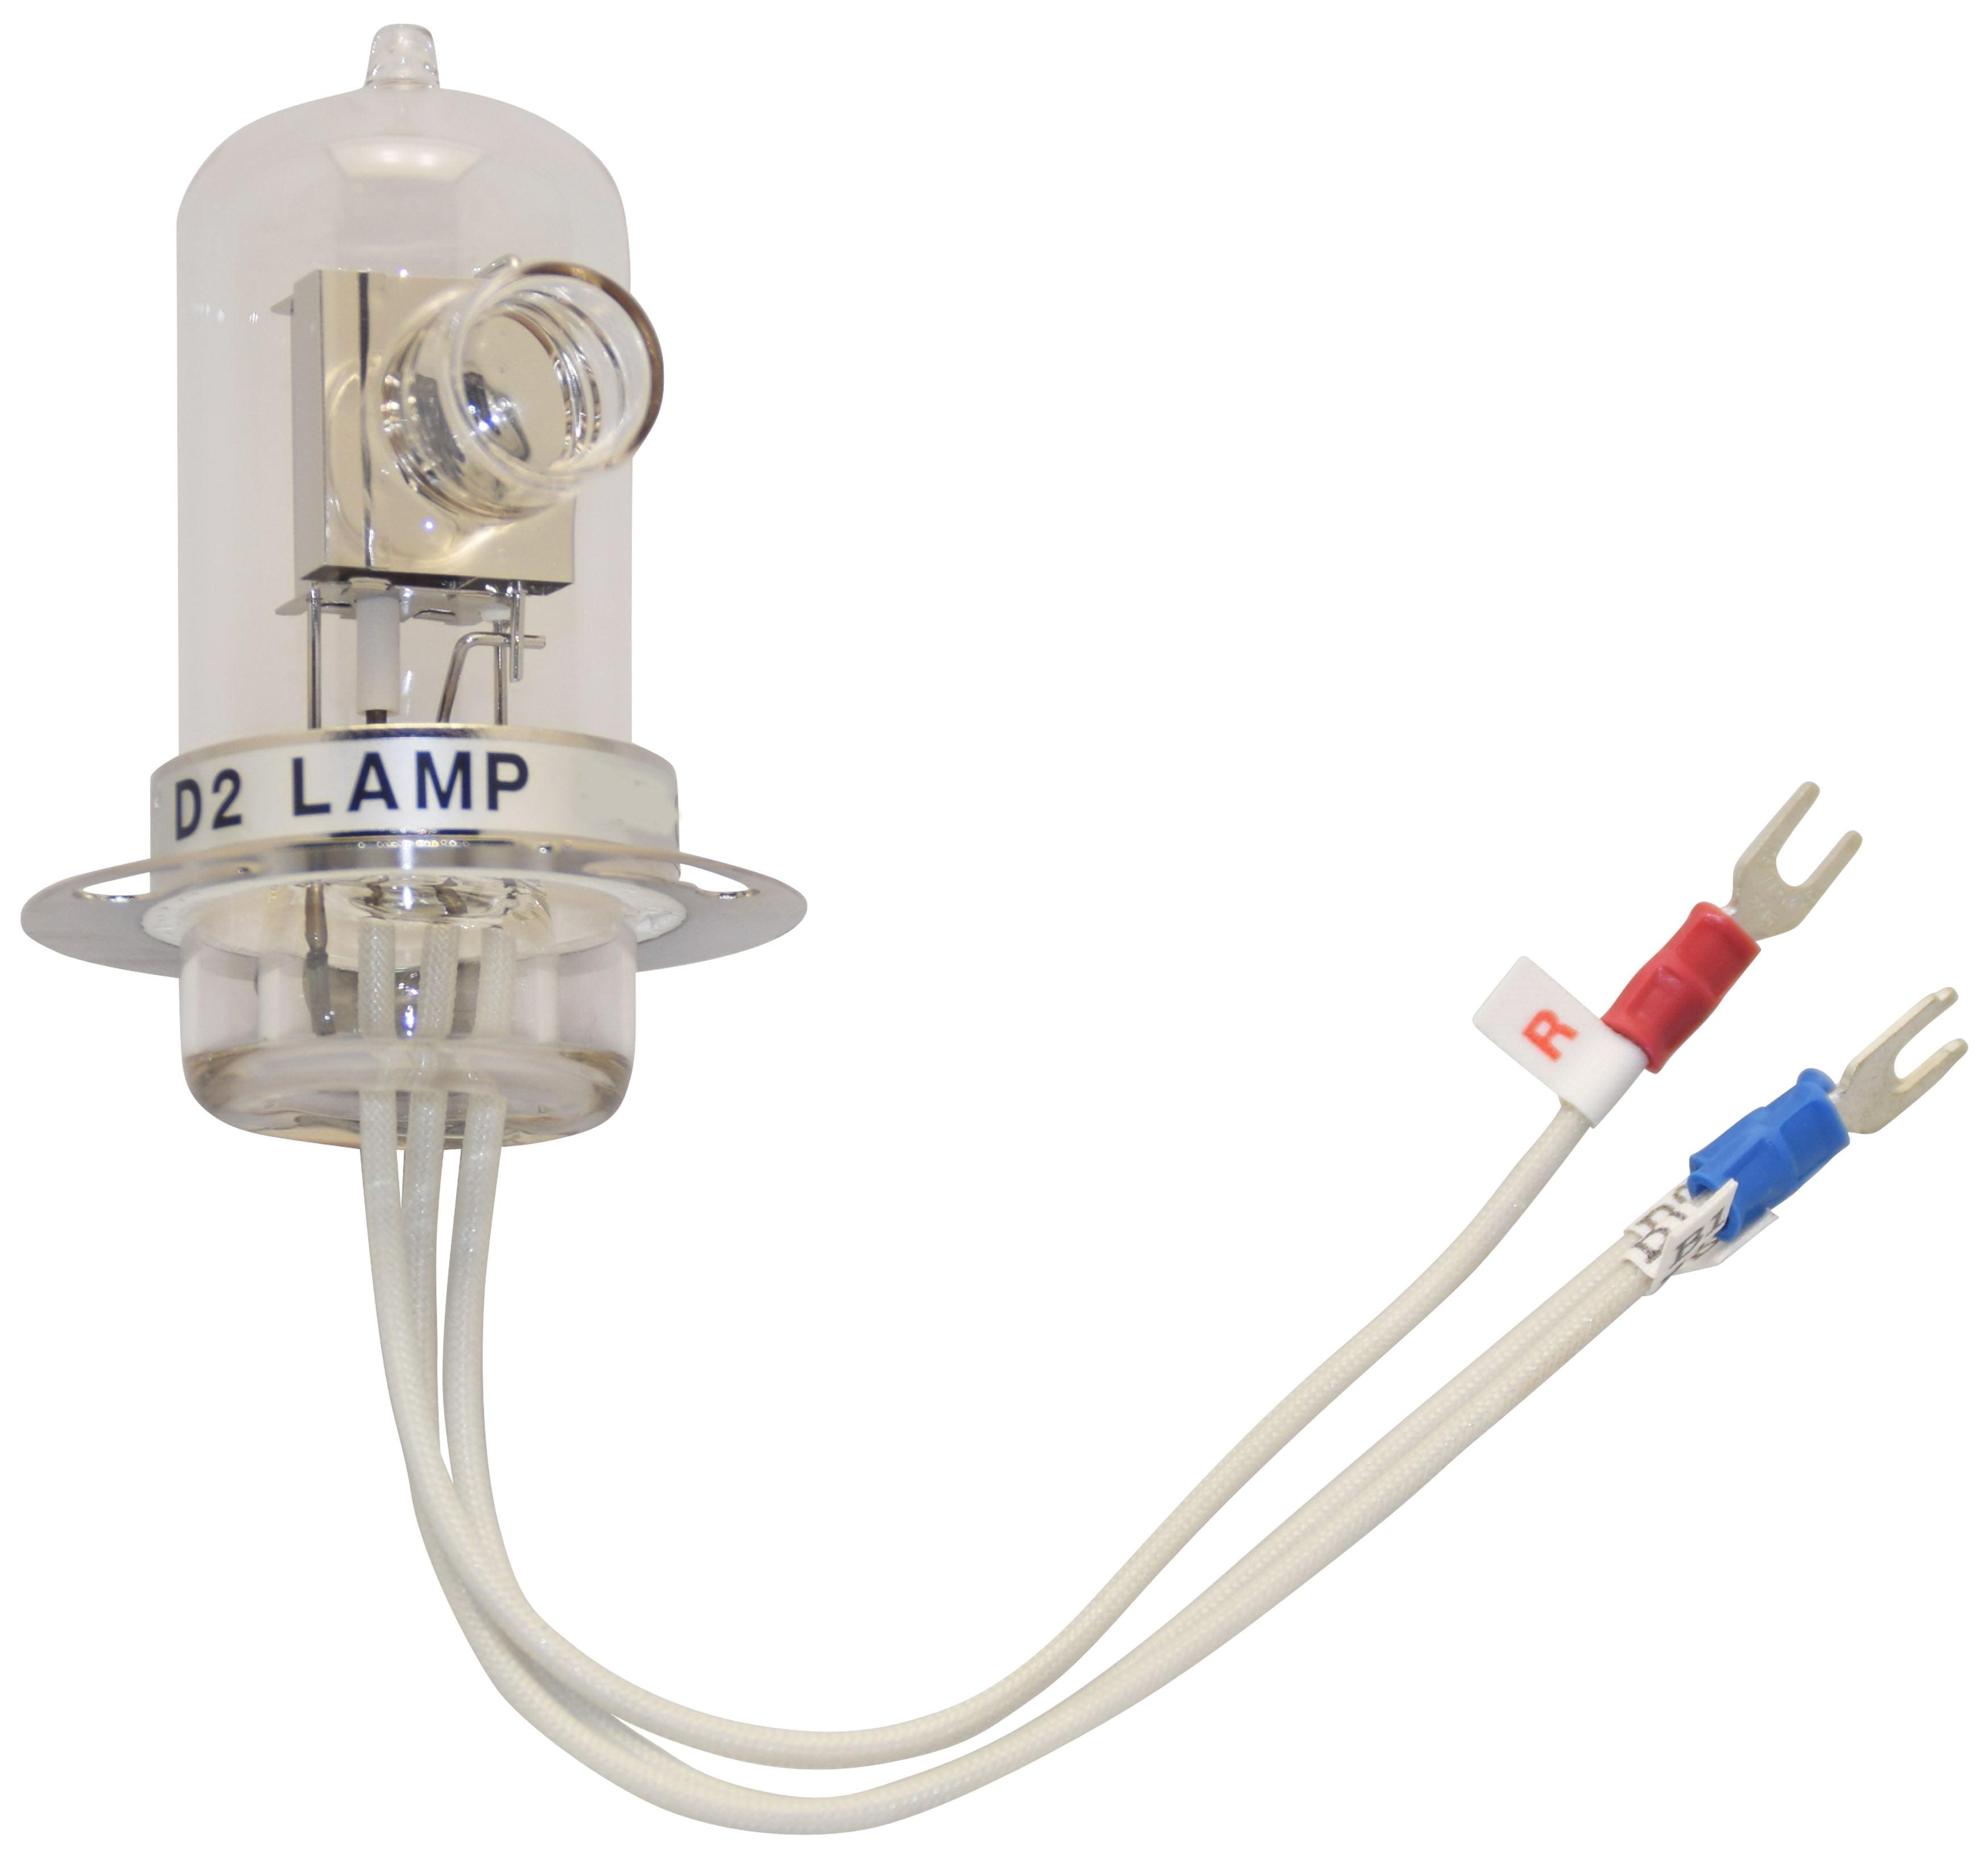 Replacement for PERKIN ELMER 557 DEUTERIUM LAMP